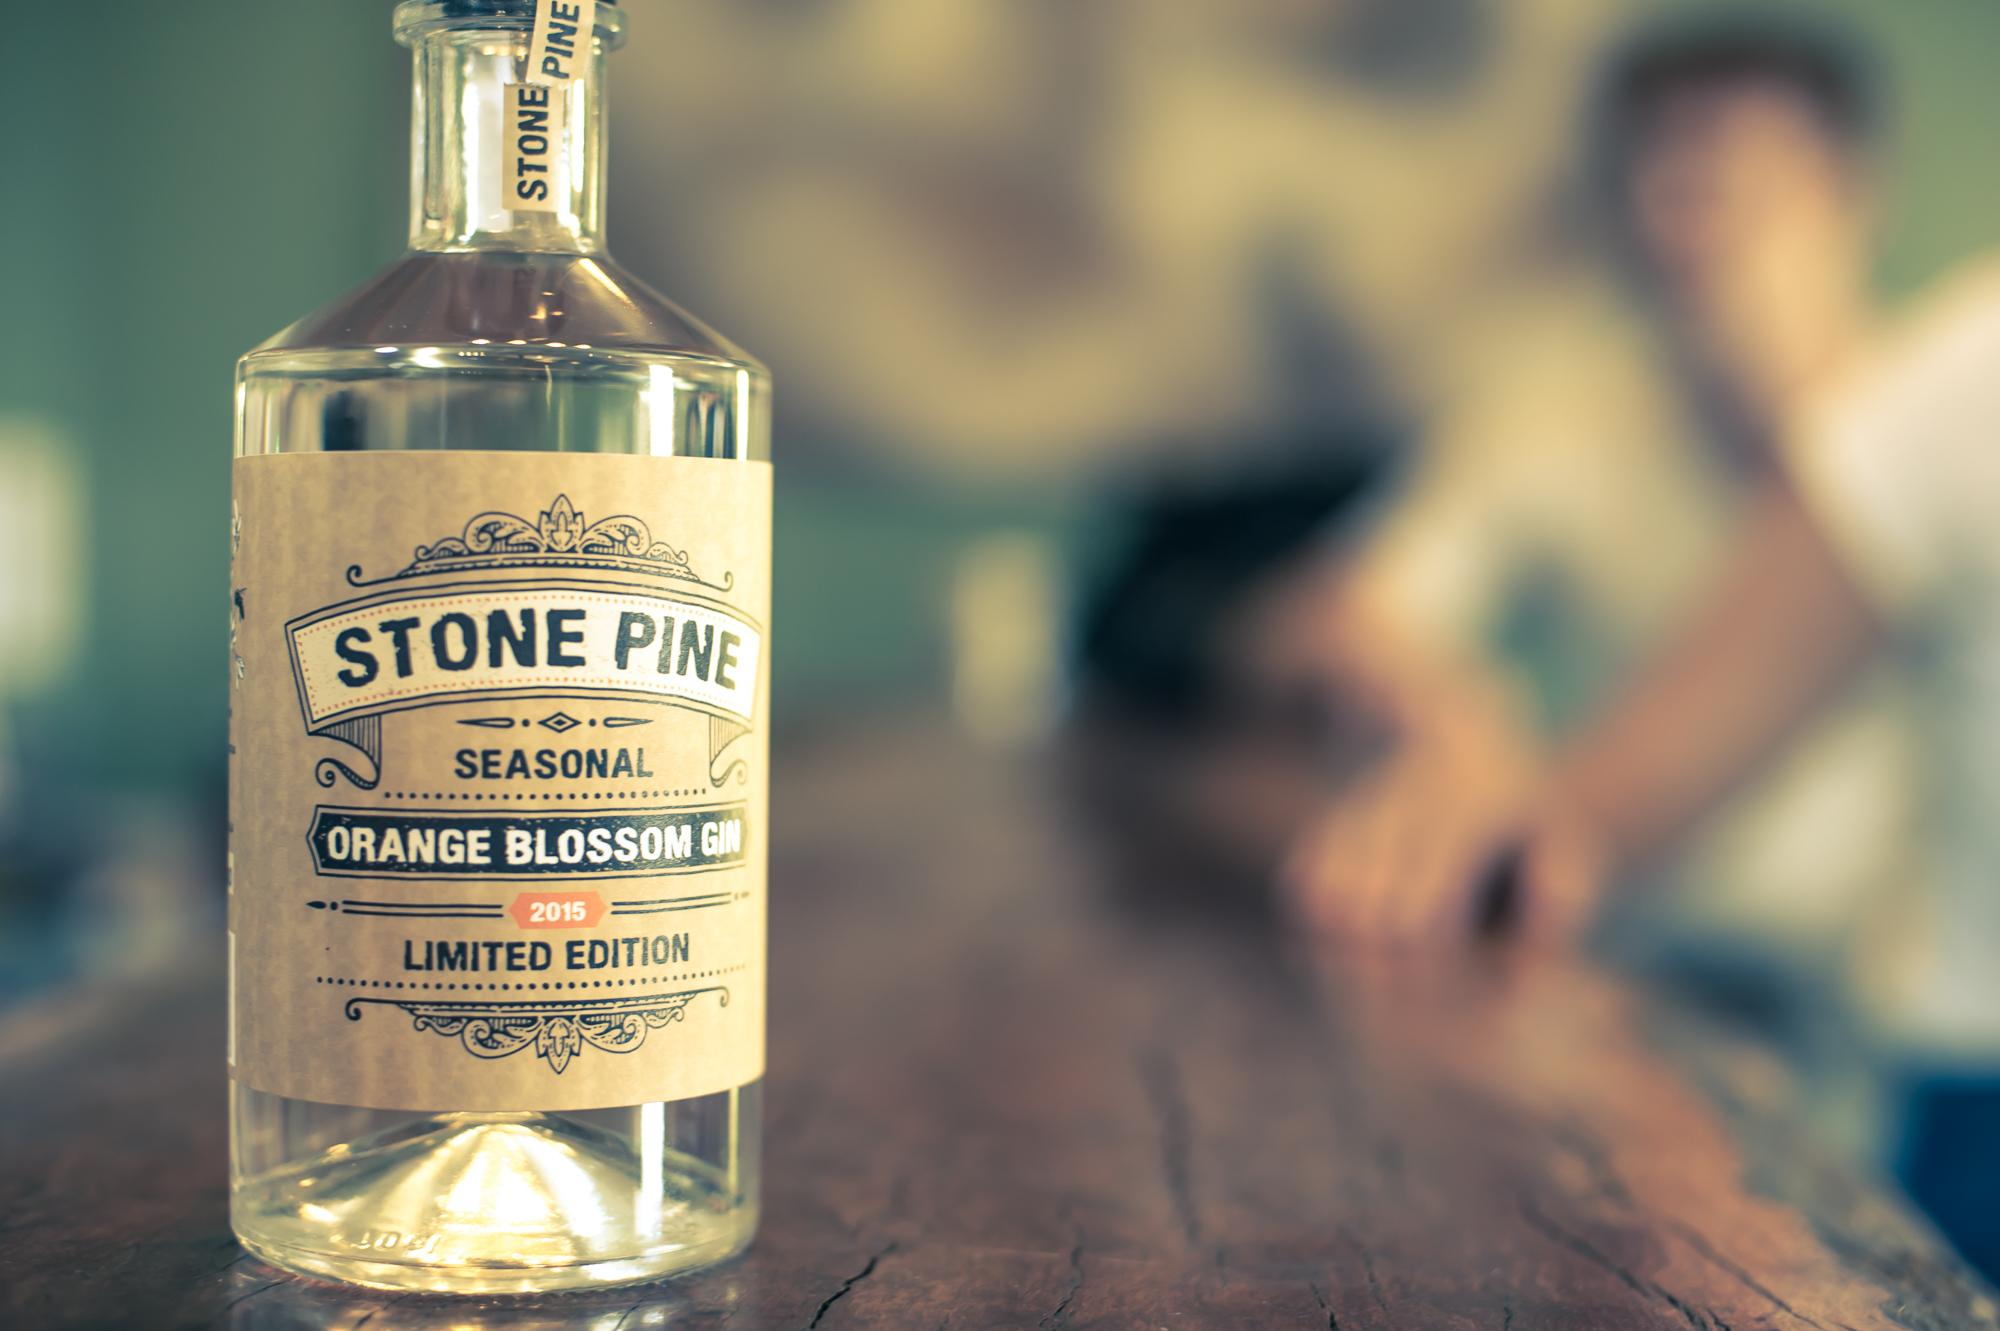 Orange Blossom Gin